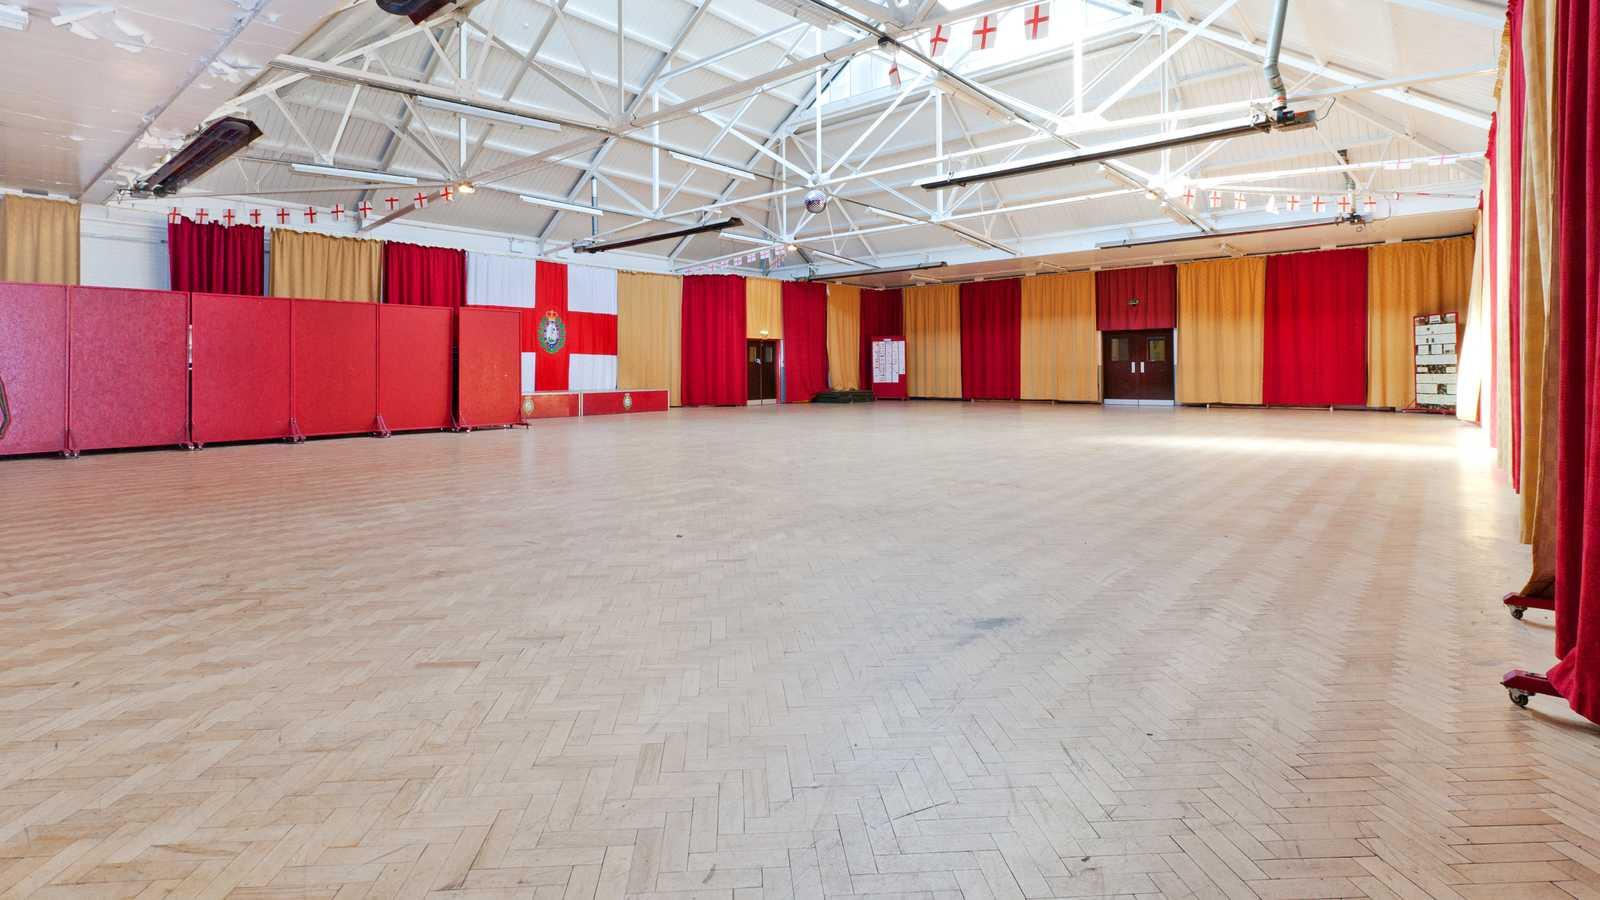 Drill Hall